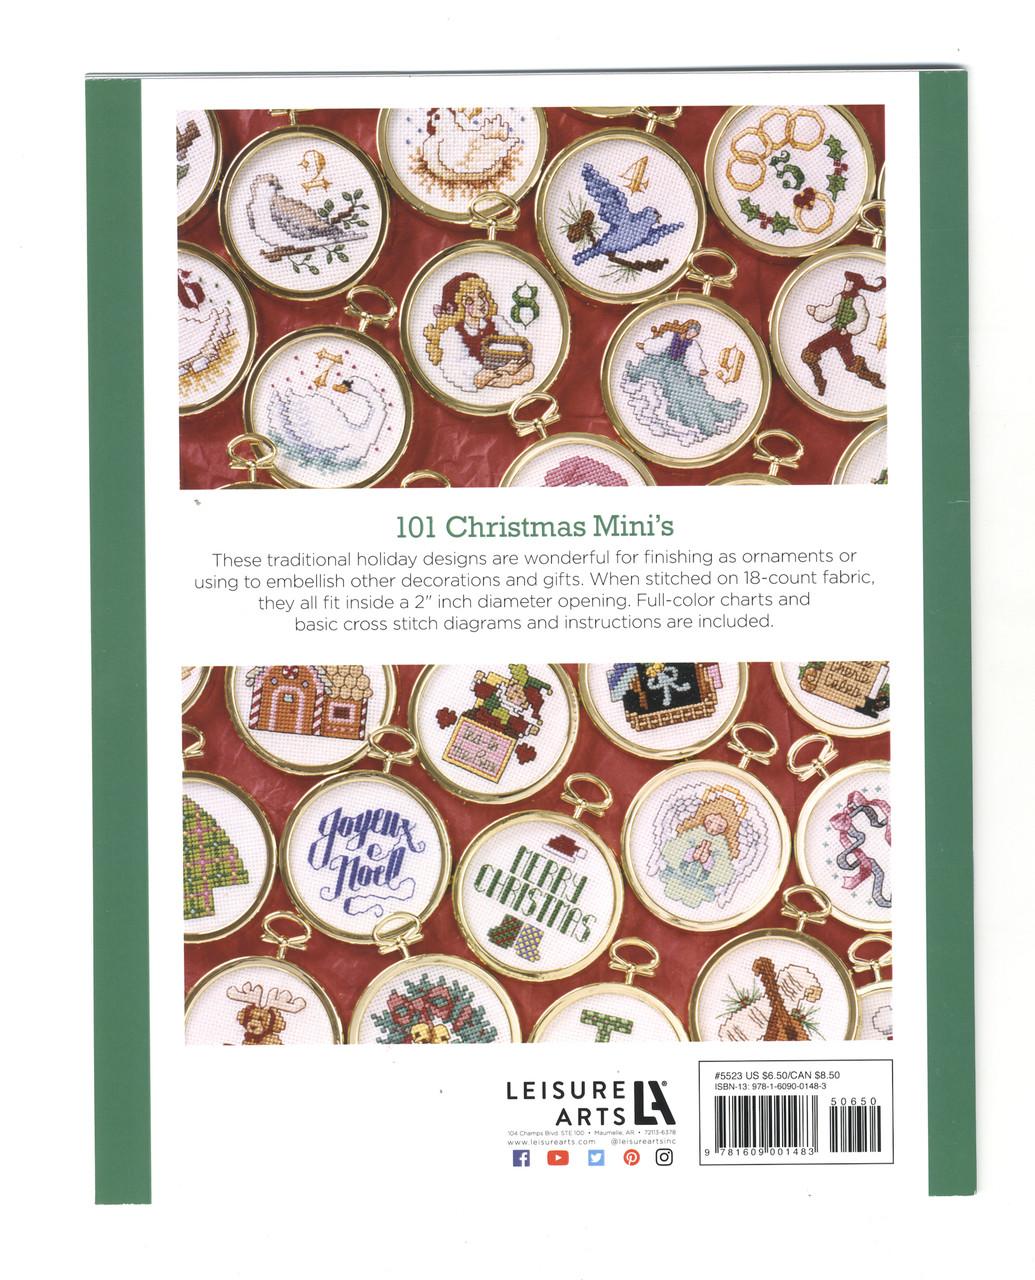 Leisure Arts - 101 Christmas Minis Book 2